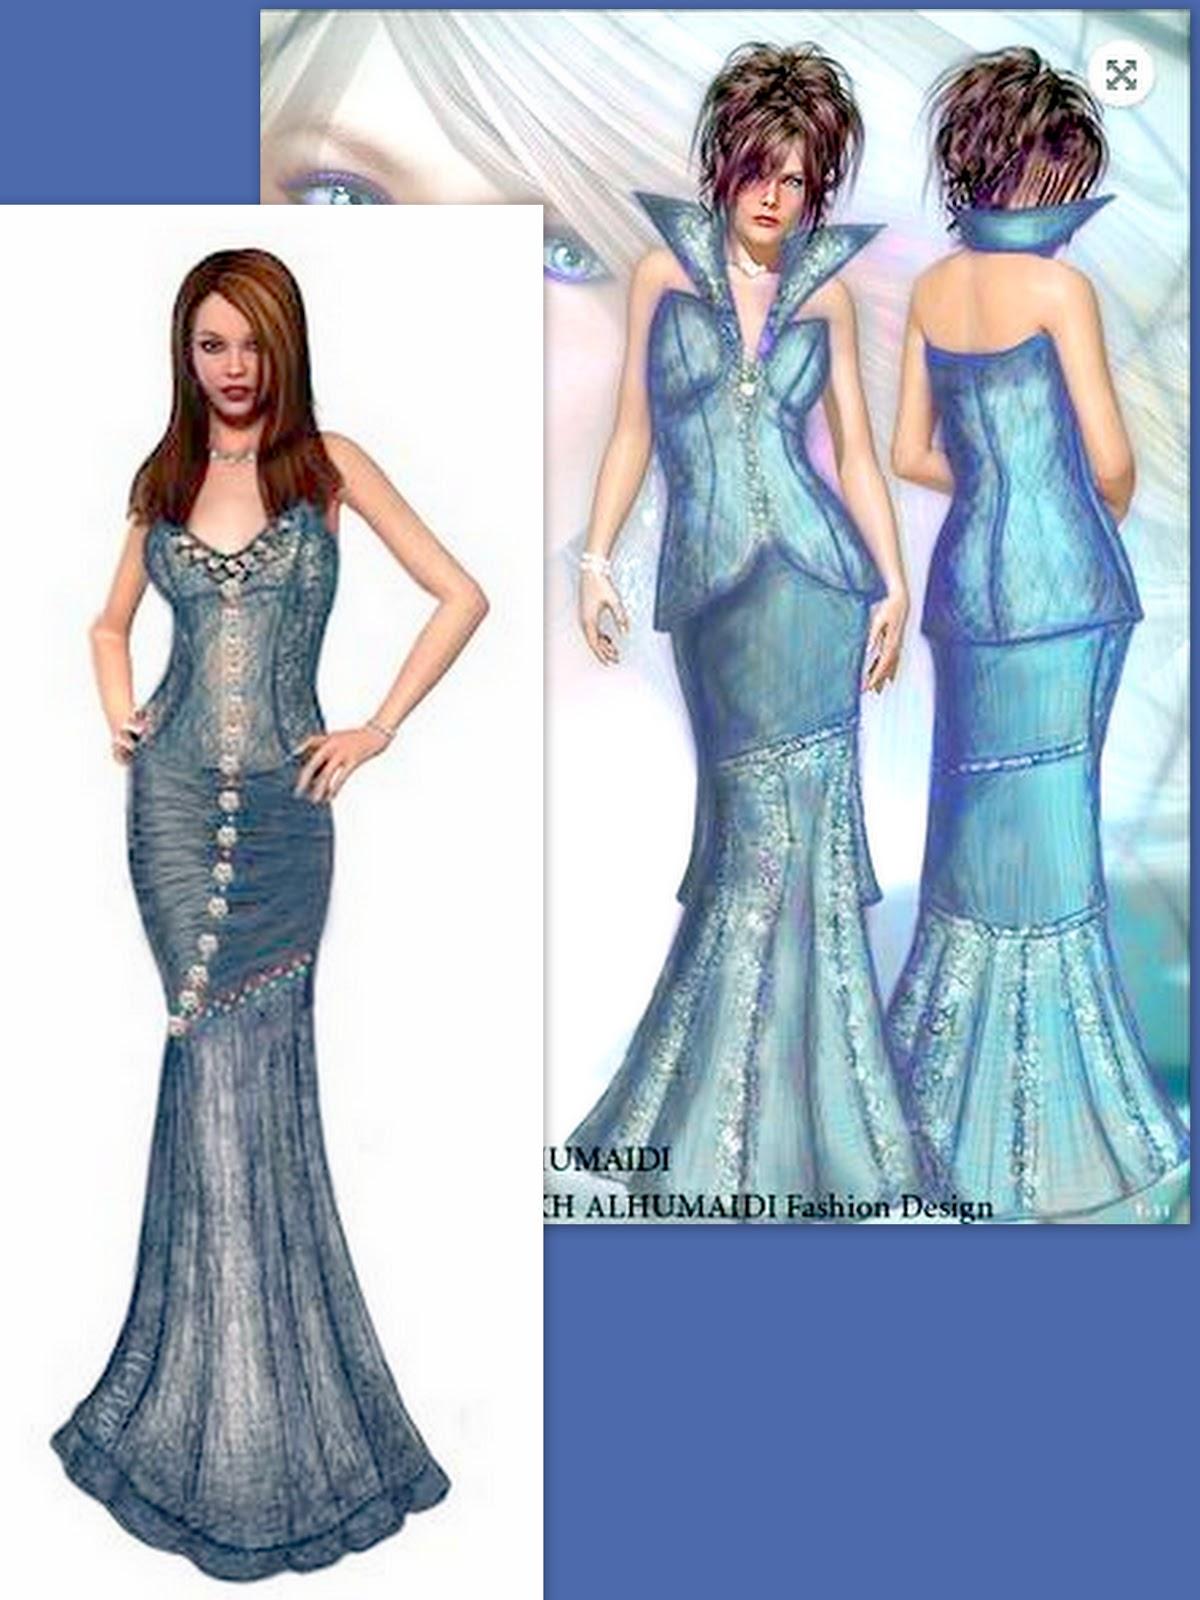 Fashion Designer Fashion Design Portfolio